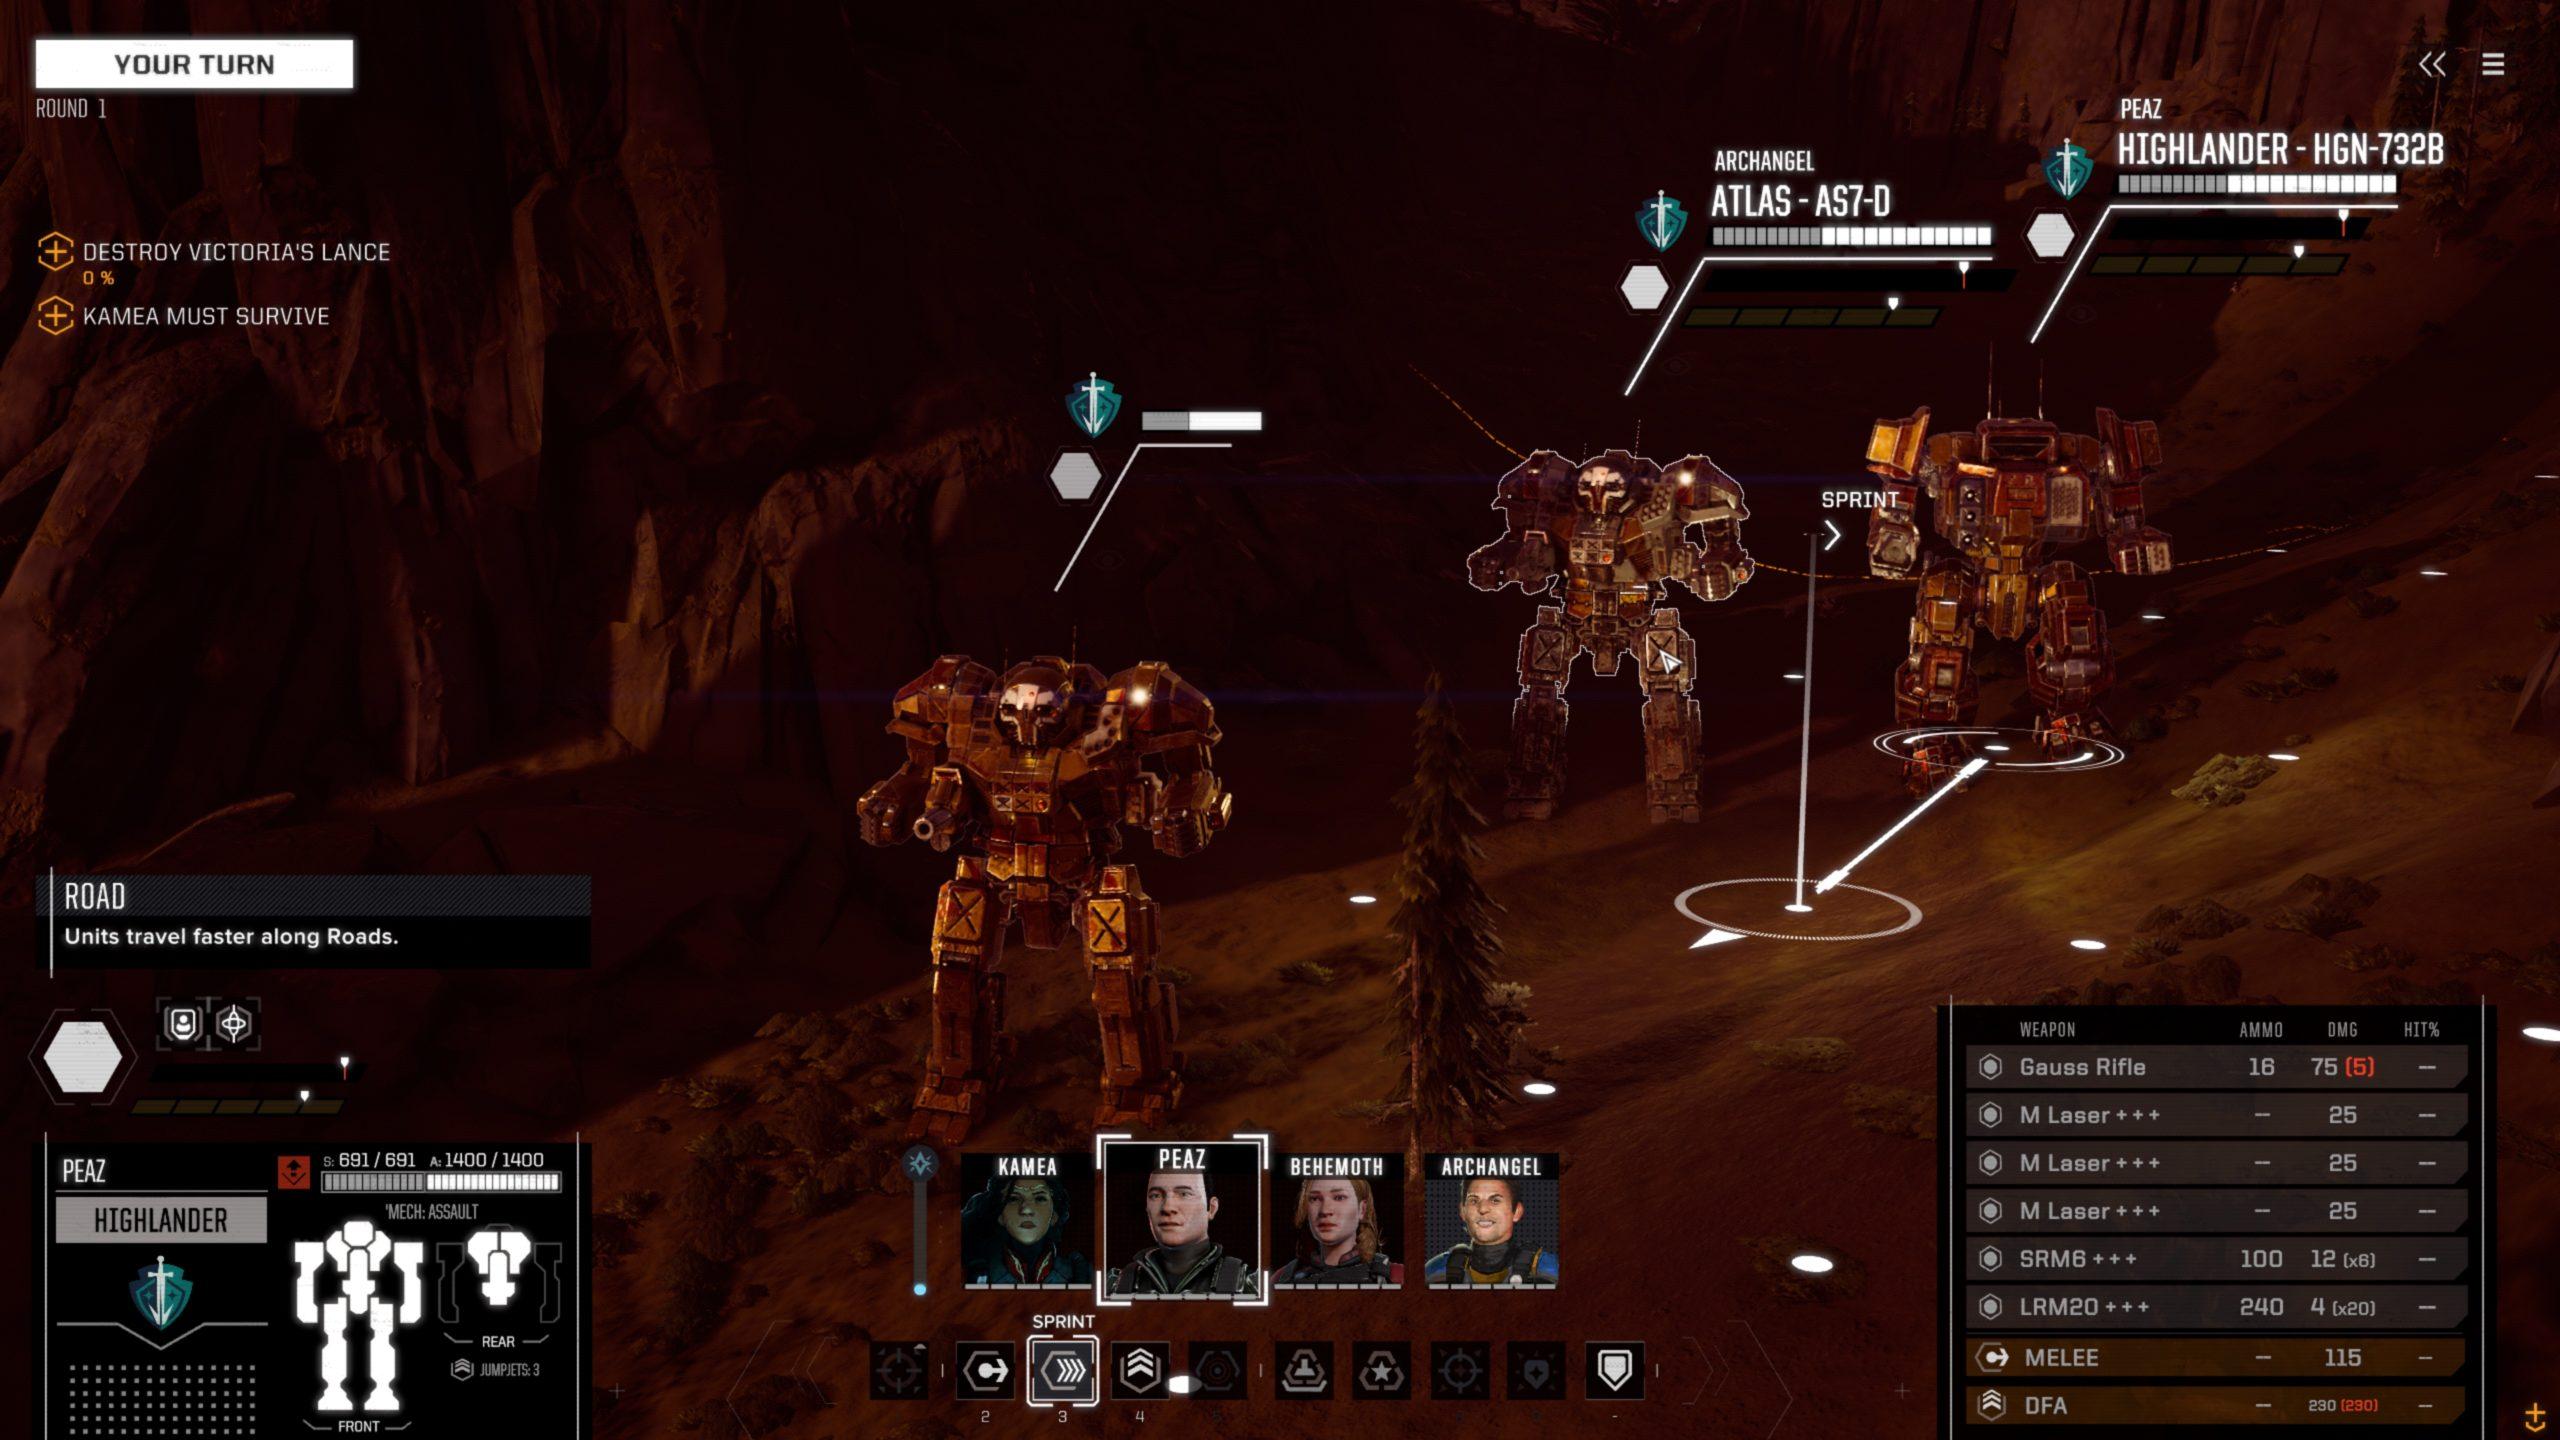 Battletech scene - close-up to the Mechs